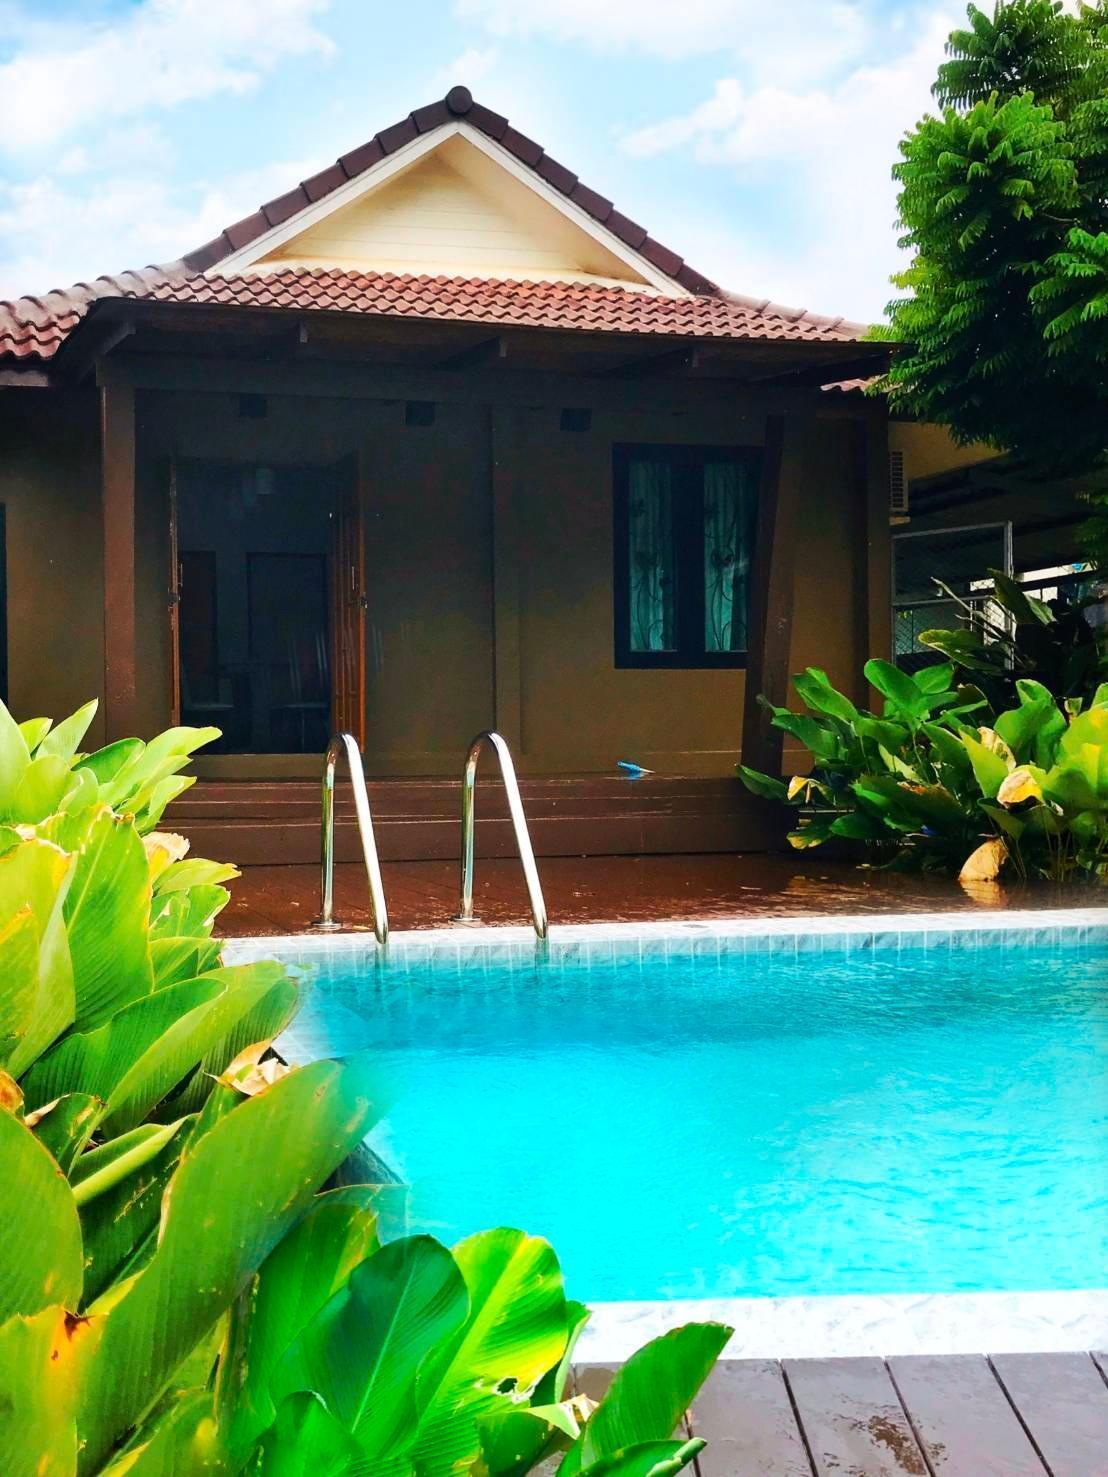 Well Journey Pool Villa, Aonang-Krabi วิลลา 2 ห้องนอน 1 ห้องน้ำส่วนตัว ขนาด 72 ตร.ม. – อ่าวนาง